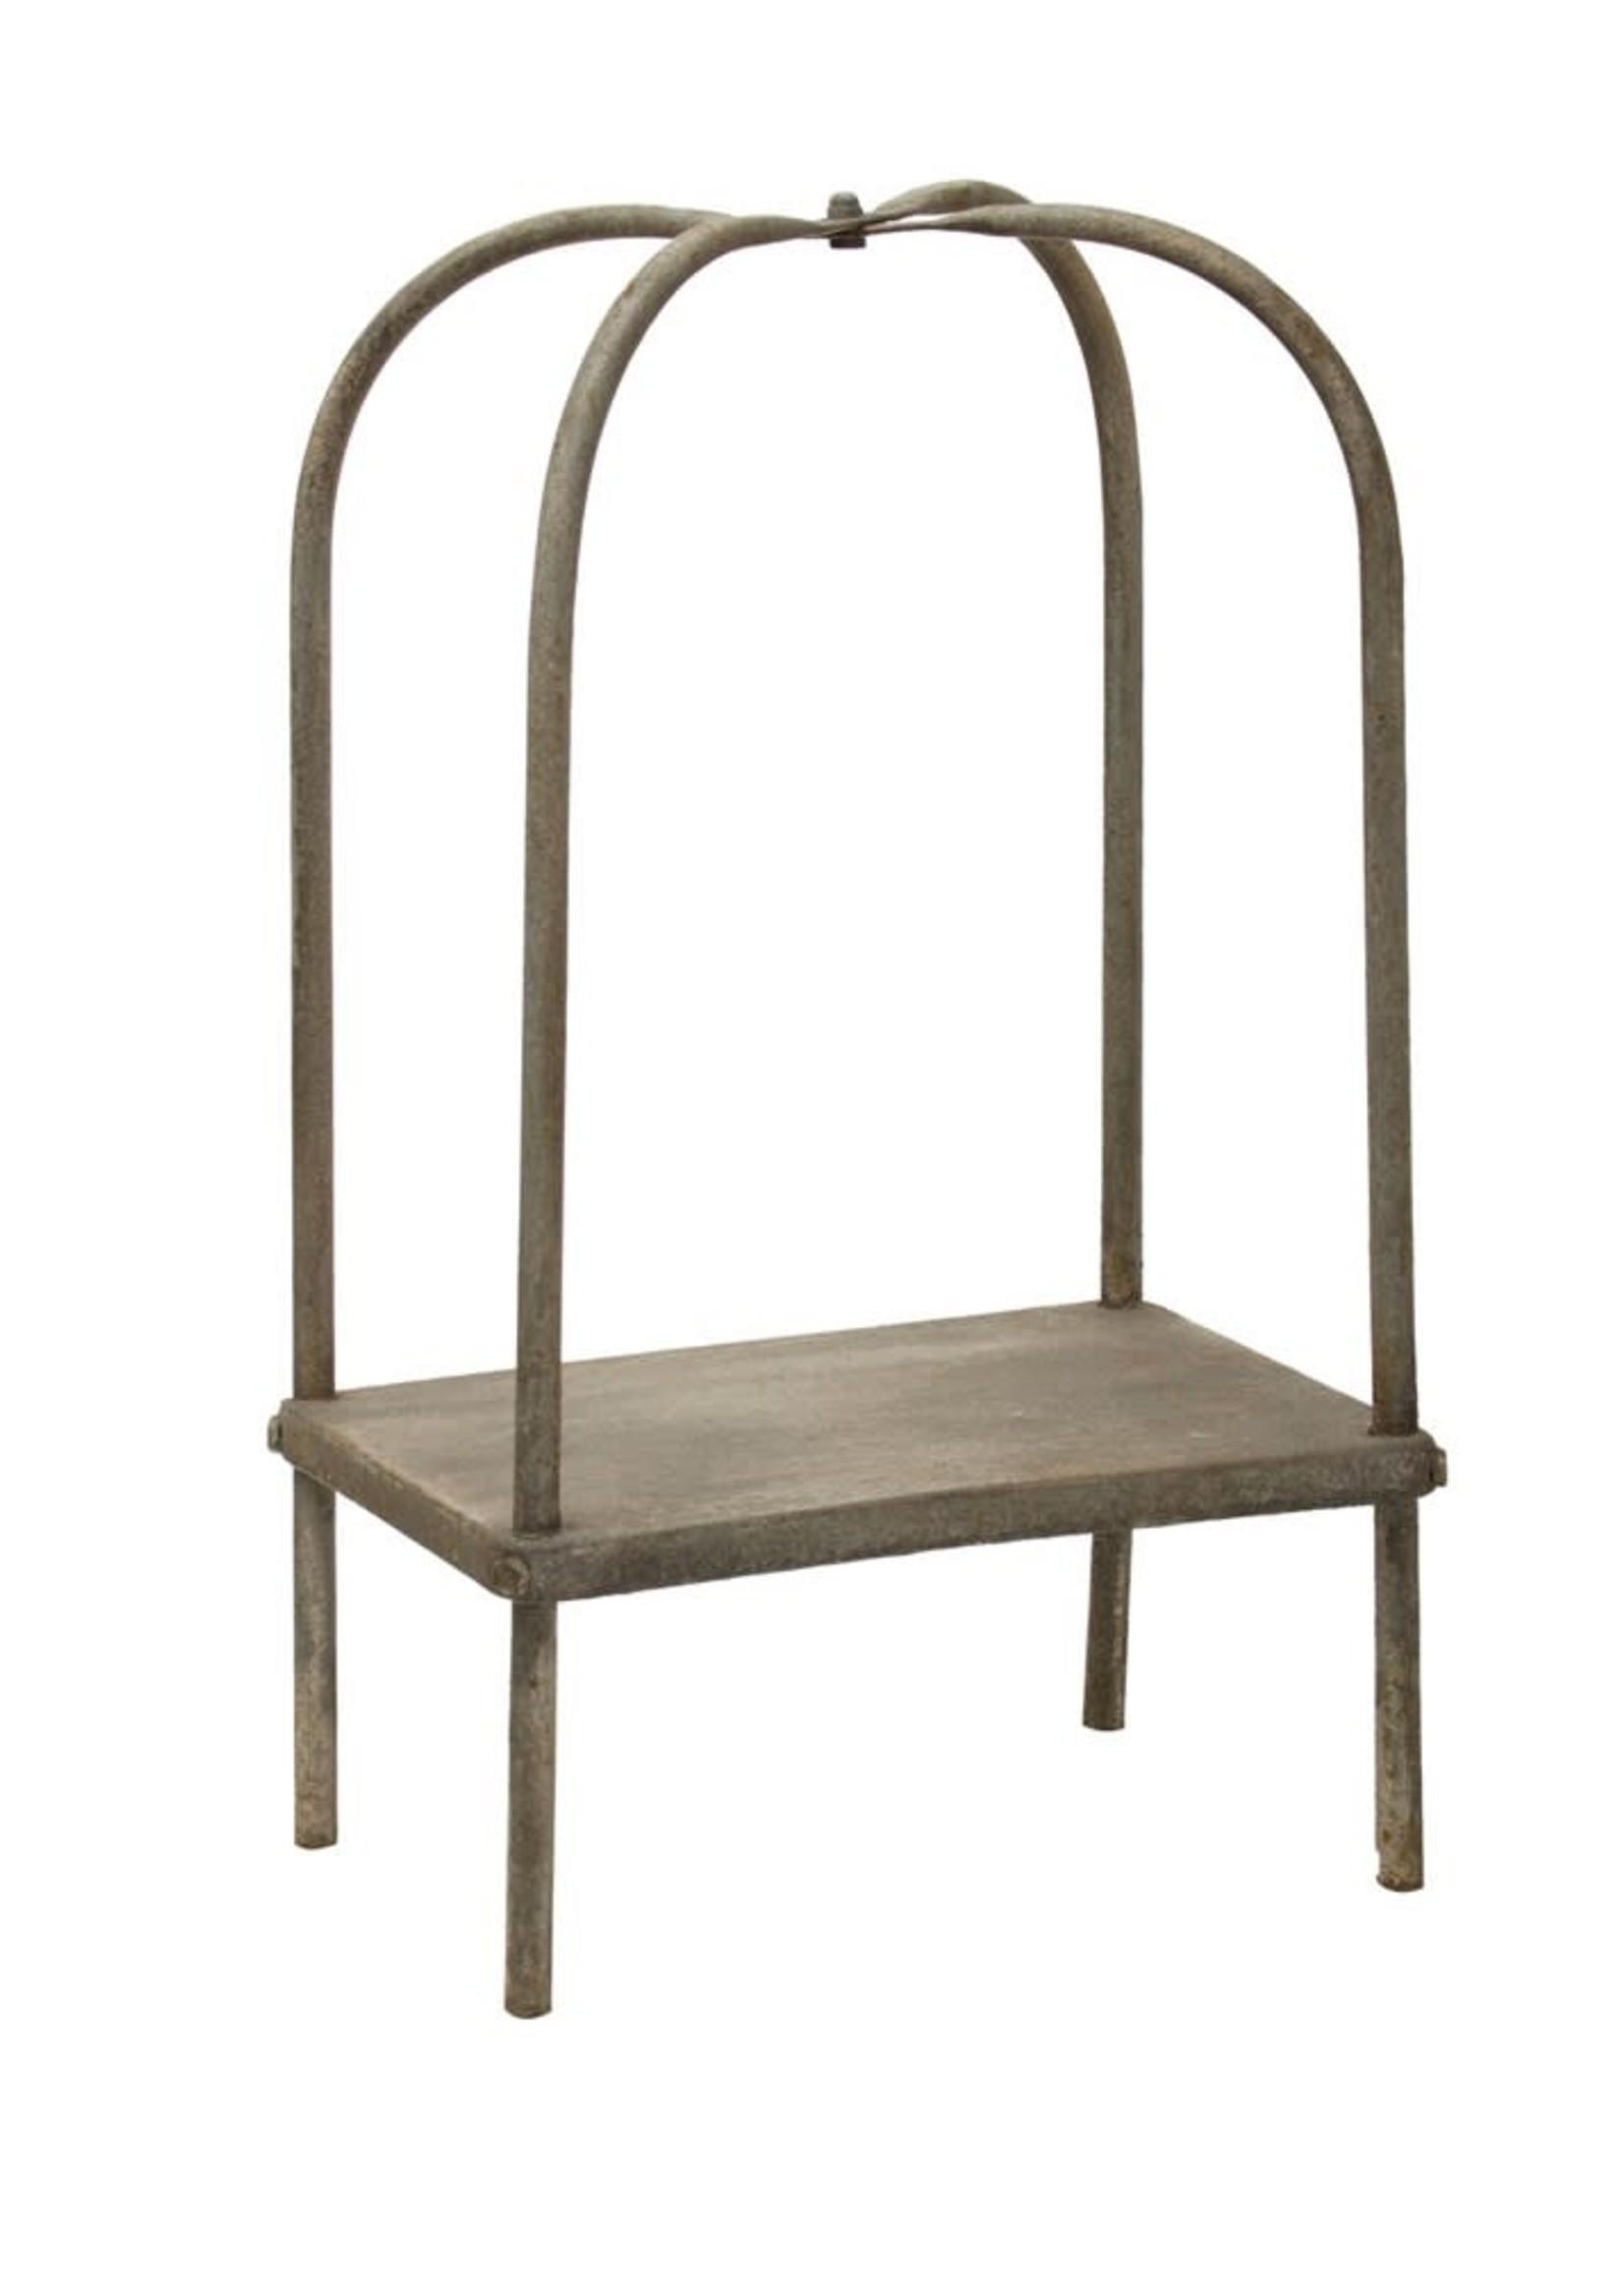 Decorative Metal Pedestal, Distressed Grey Finish